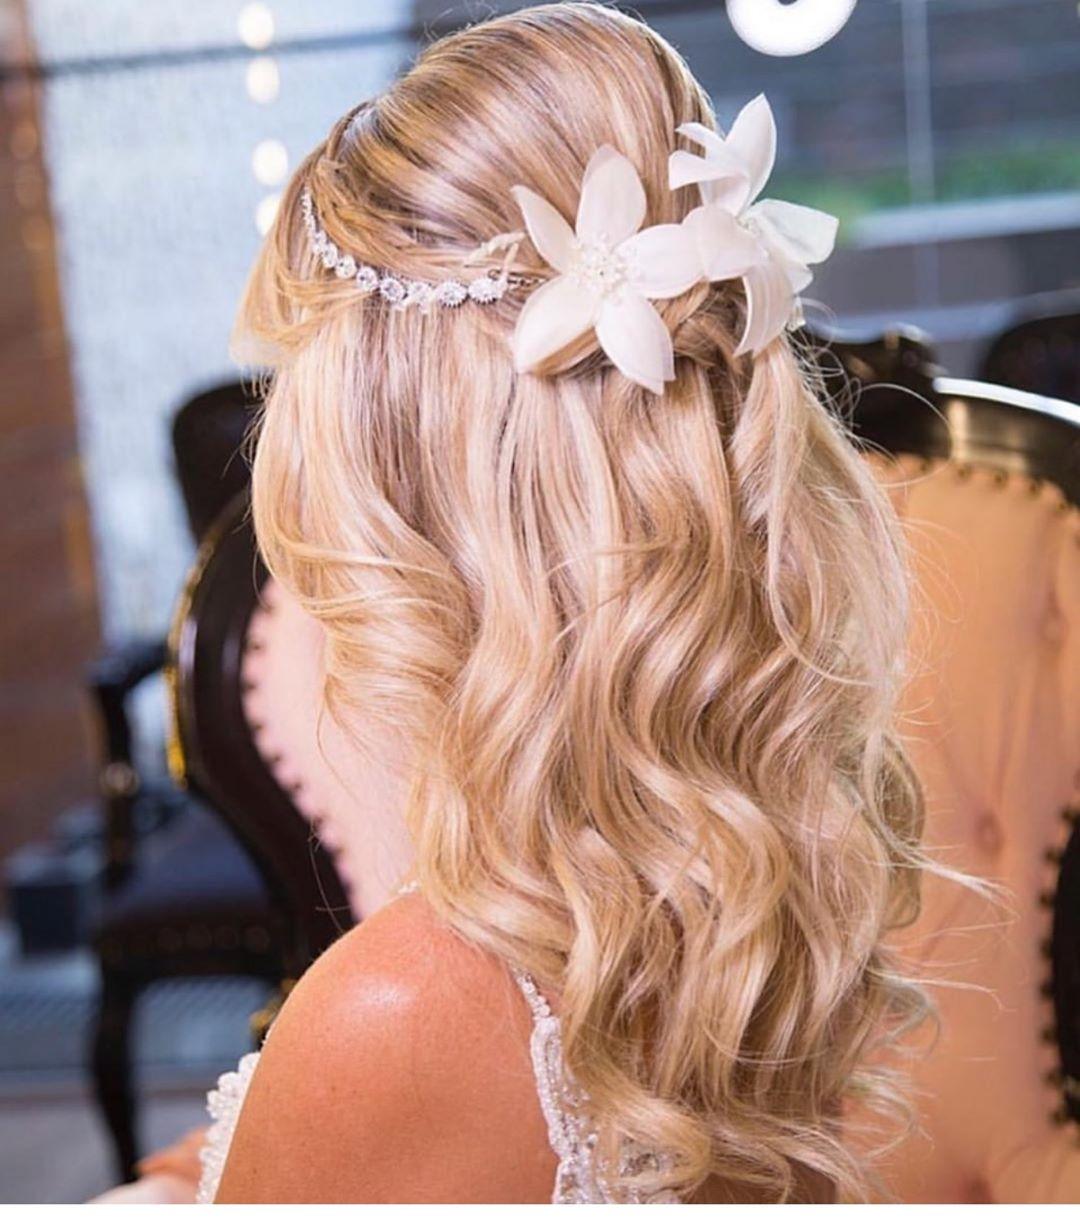 penteados para noiva solto